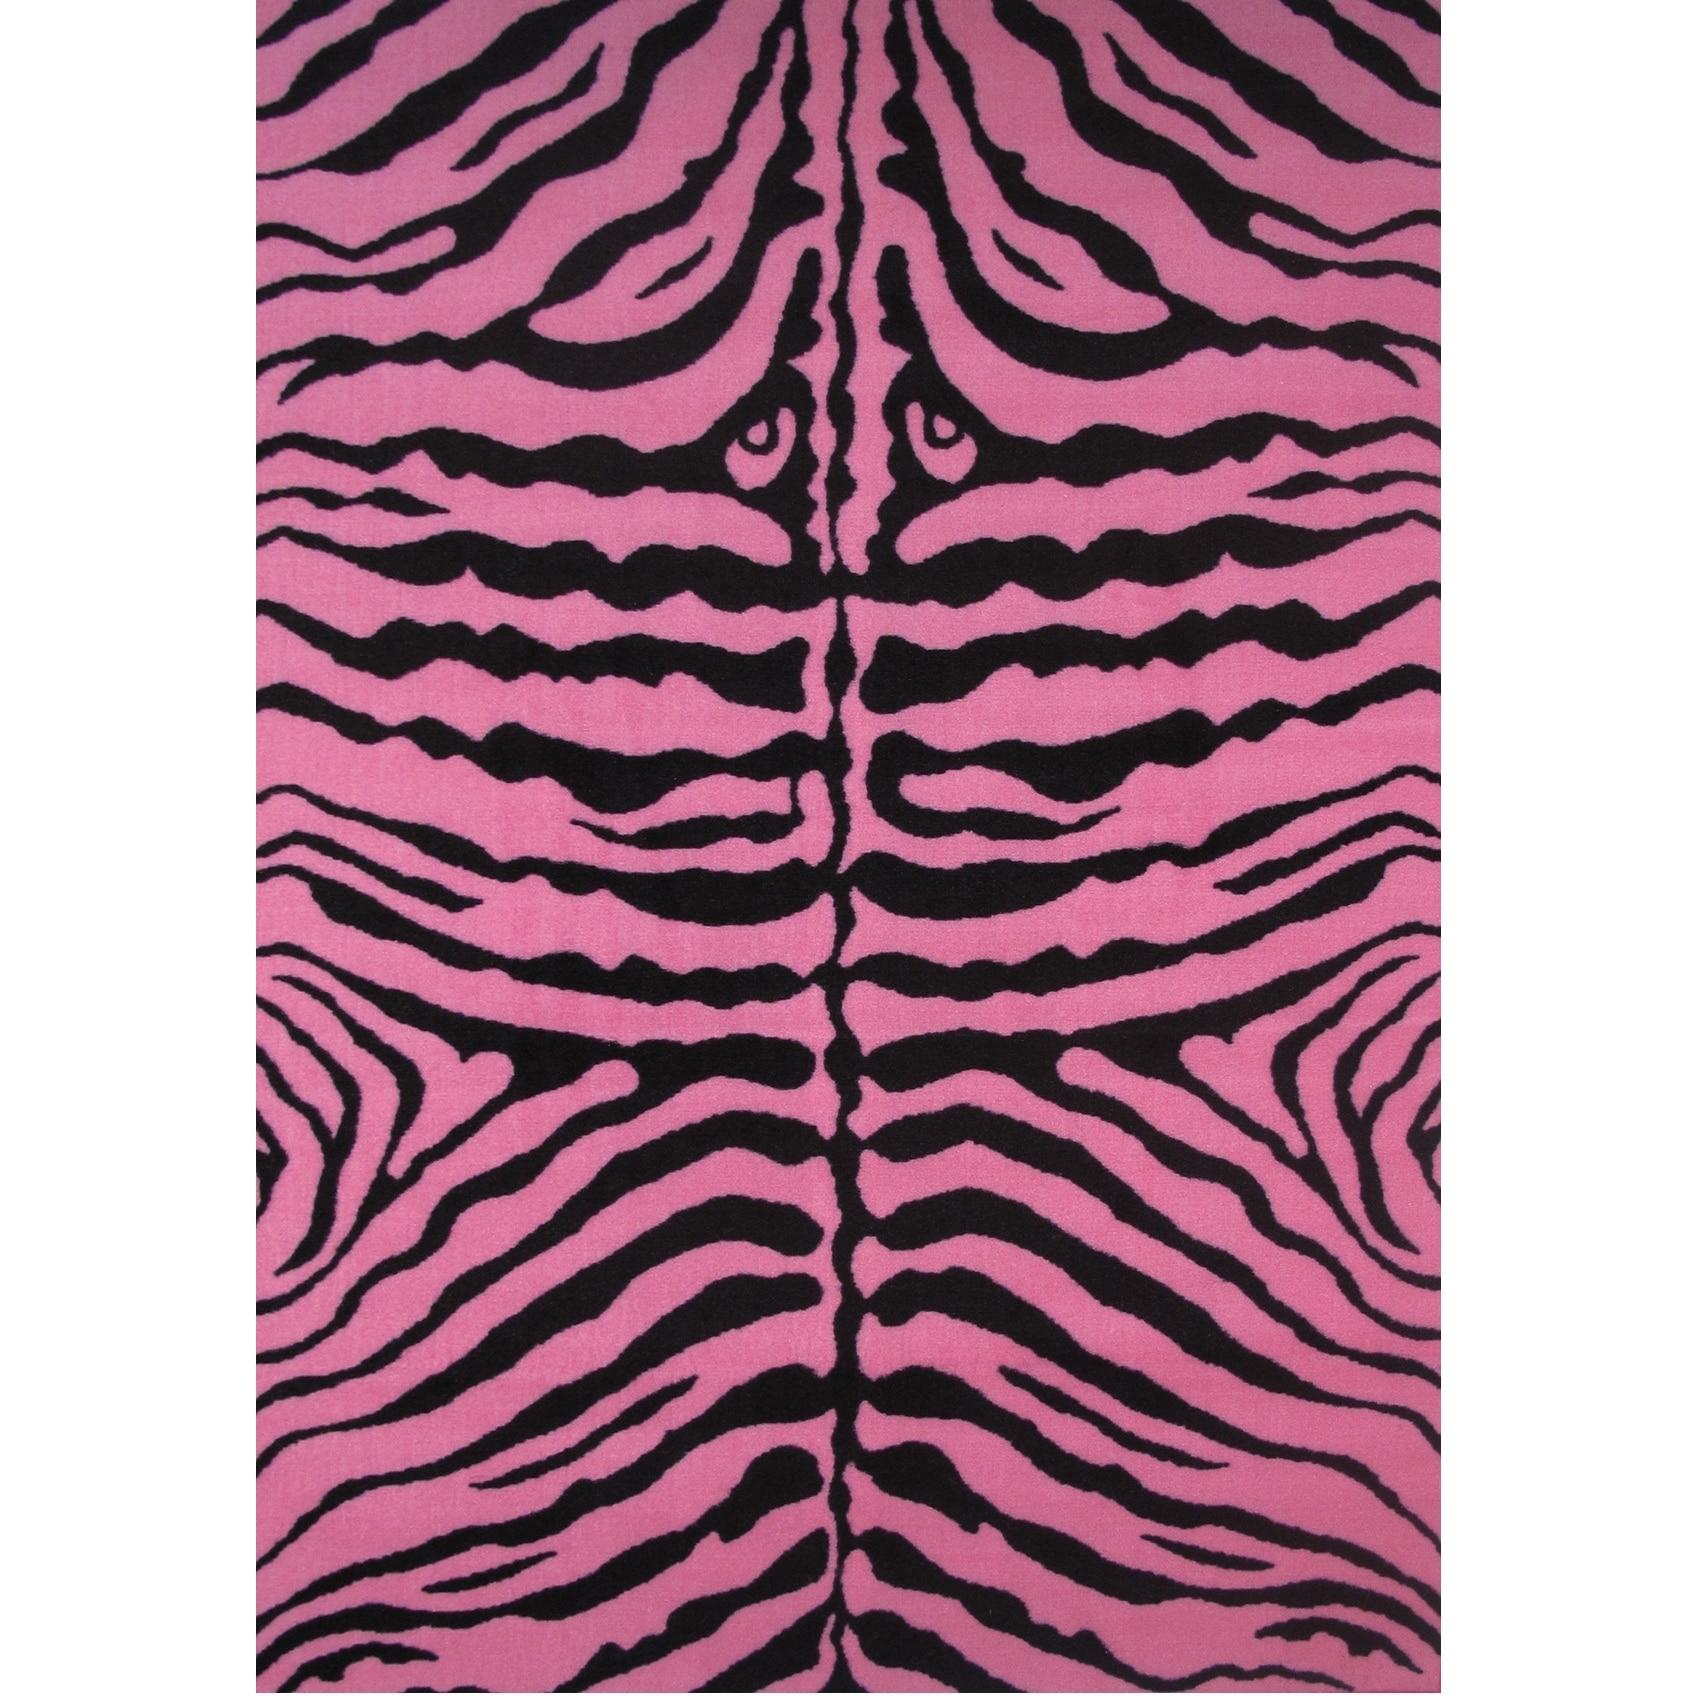 LA RUG Zebra Pink Accent Rug (1'6 x 2'4) (19 inch x 29 in...